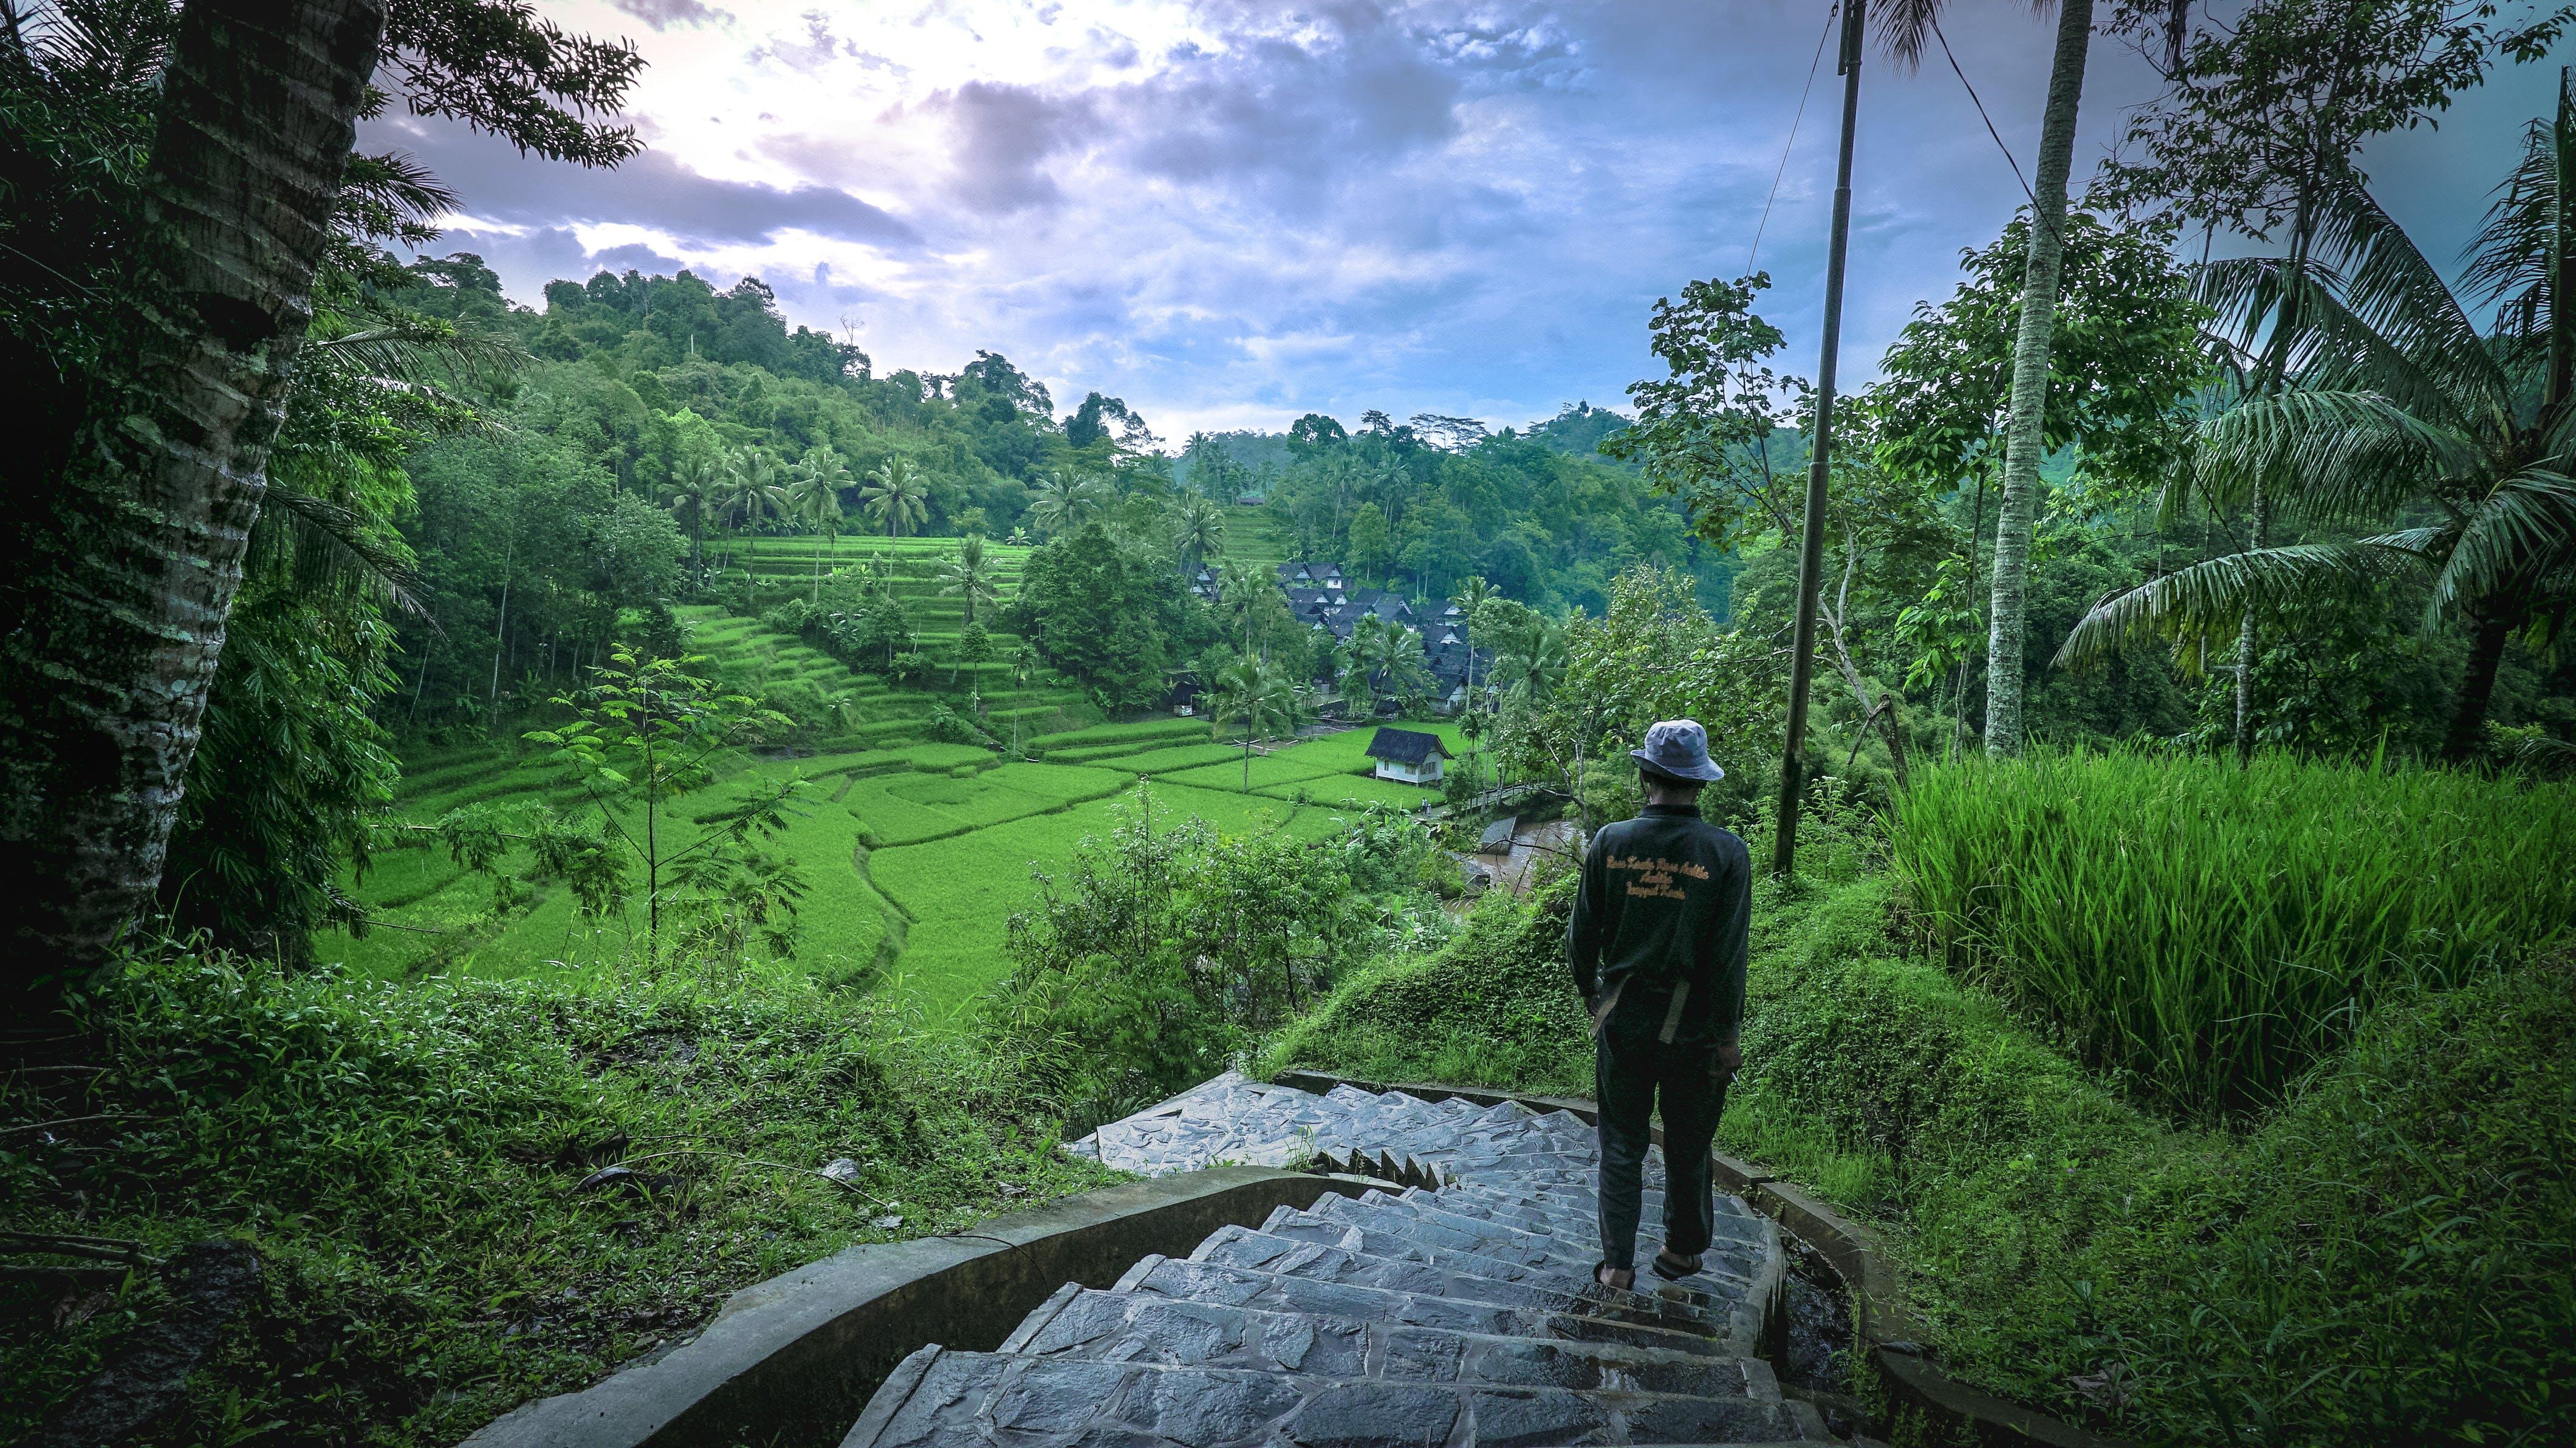 Free stock photo of landscape, nature, man, village